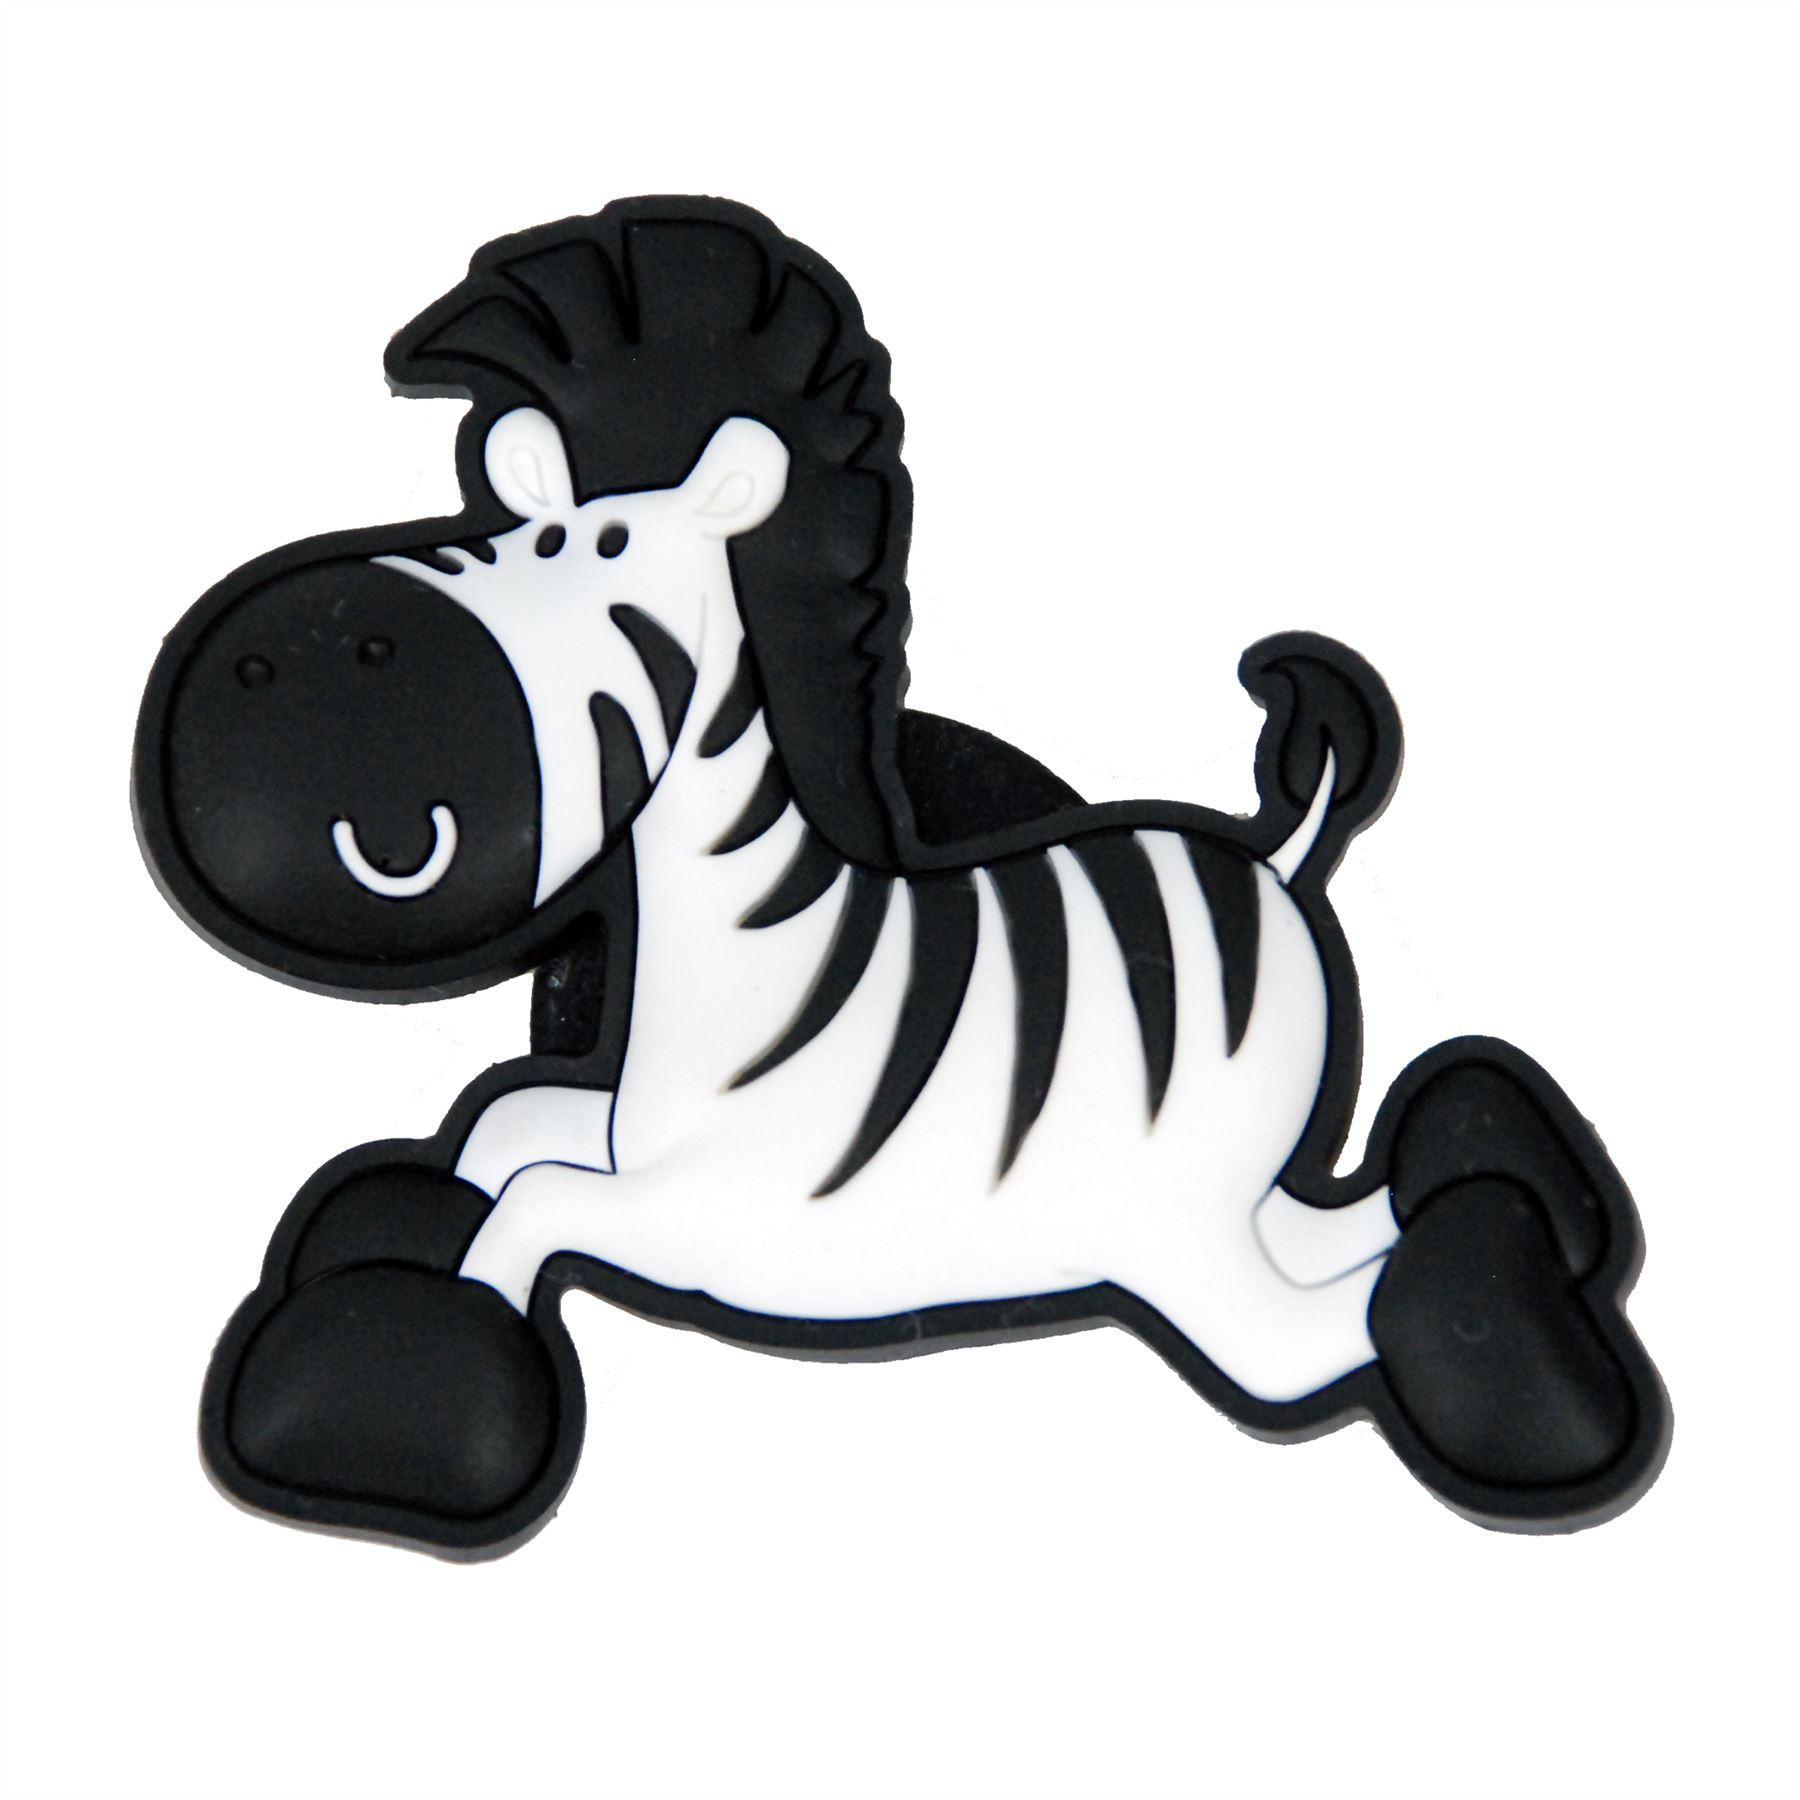 12 x CrazyGadget® Jungle Animal Soft Fridge Magnets 2 Sets to choose from